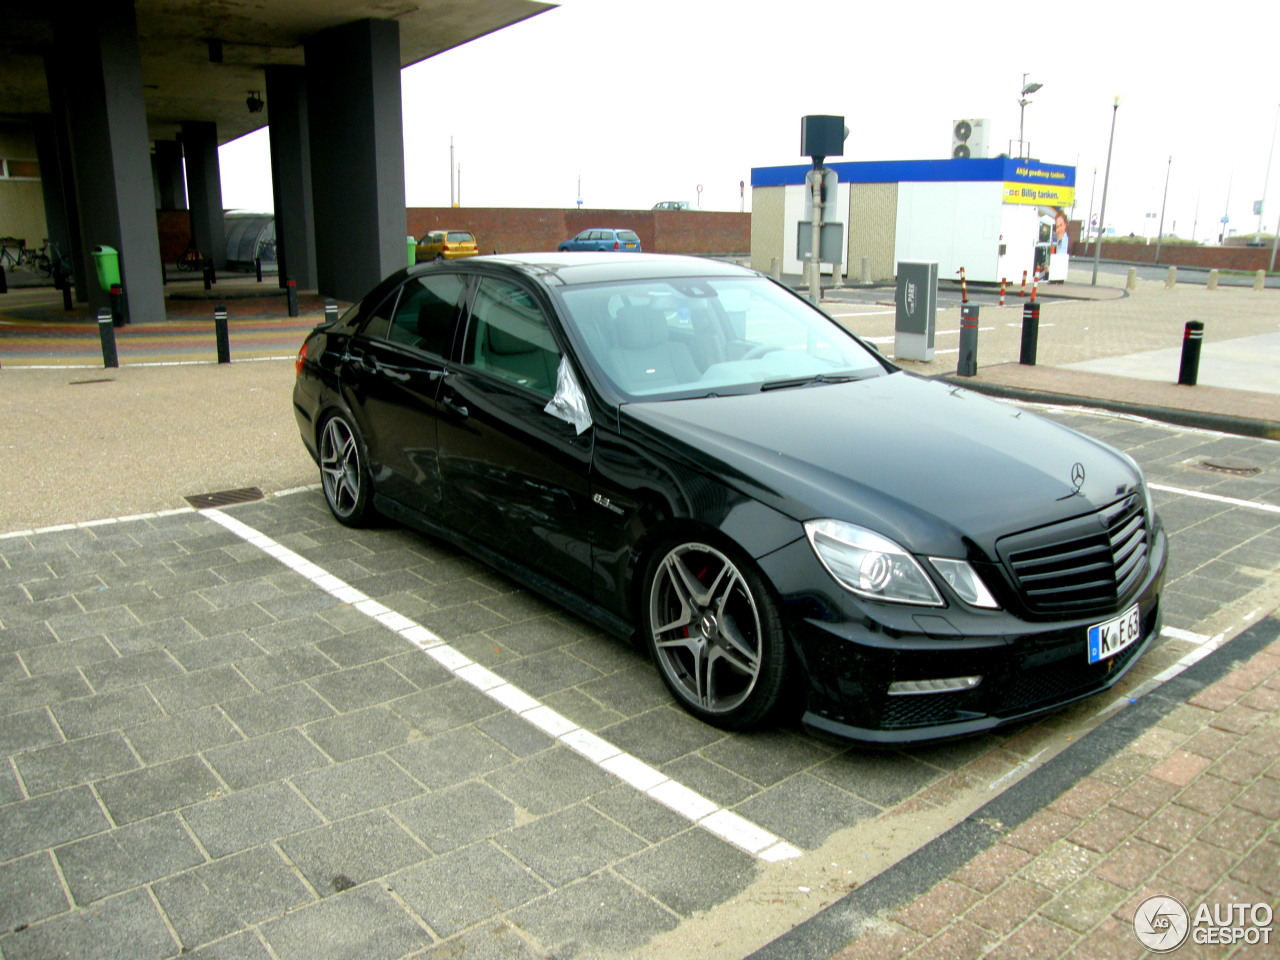 Mercedes Benz E 63 Amg W212 18 November 2012 Autogespot